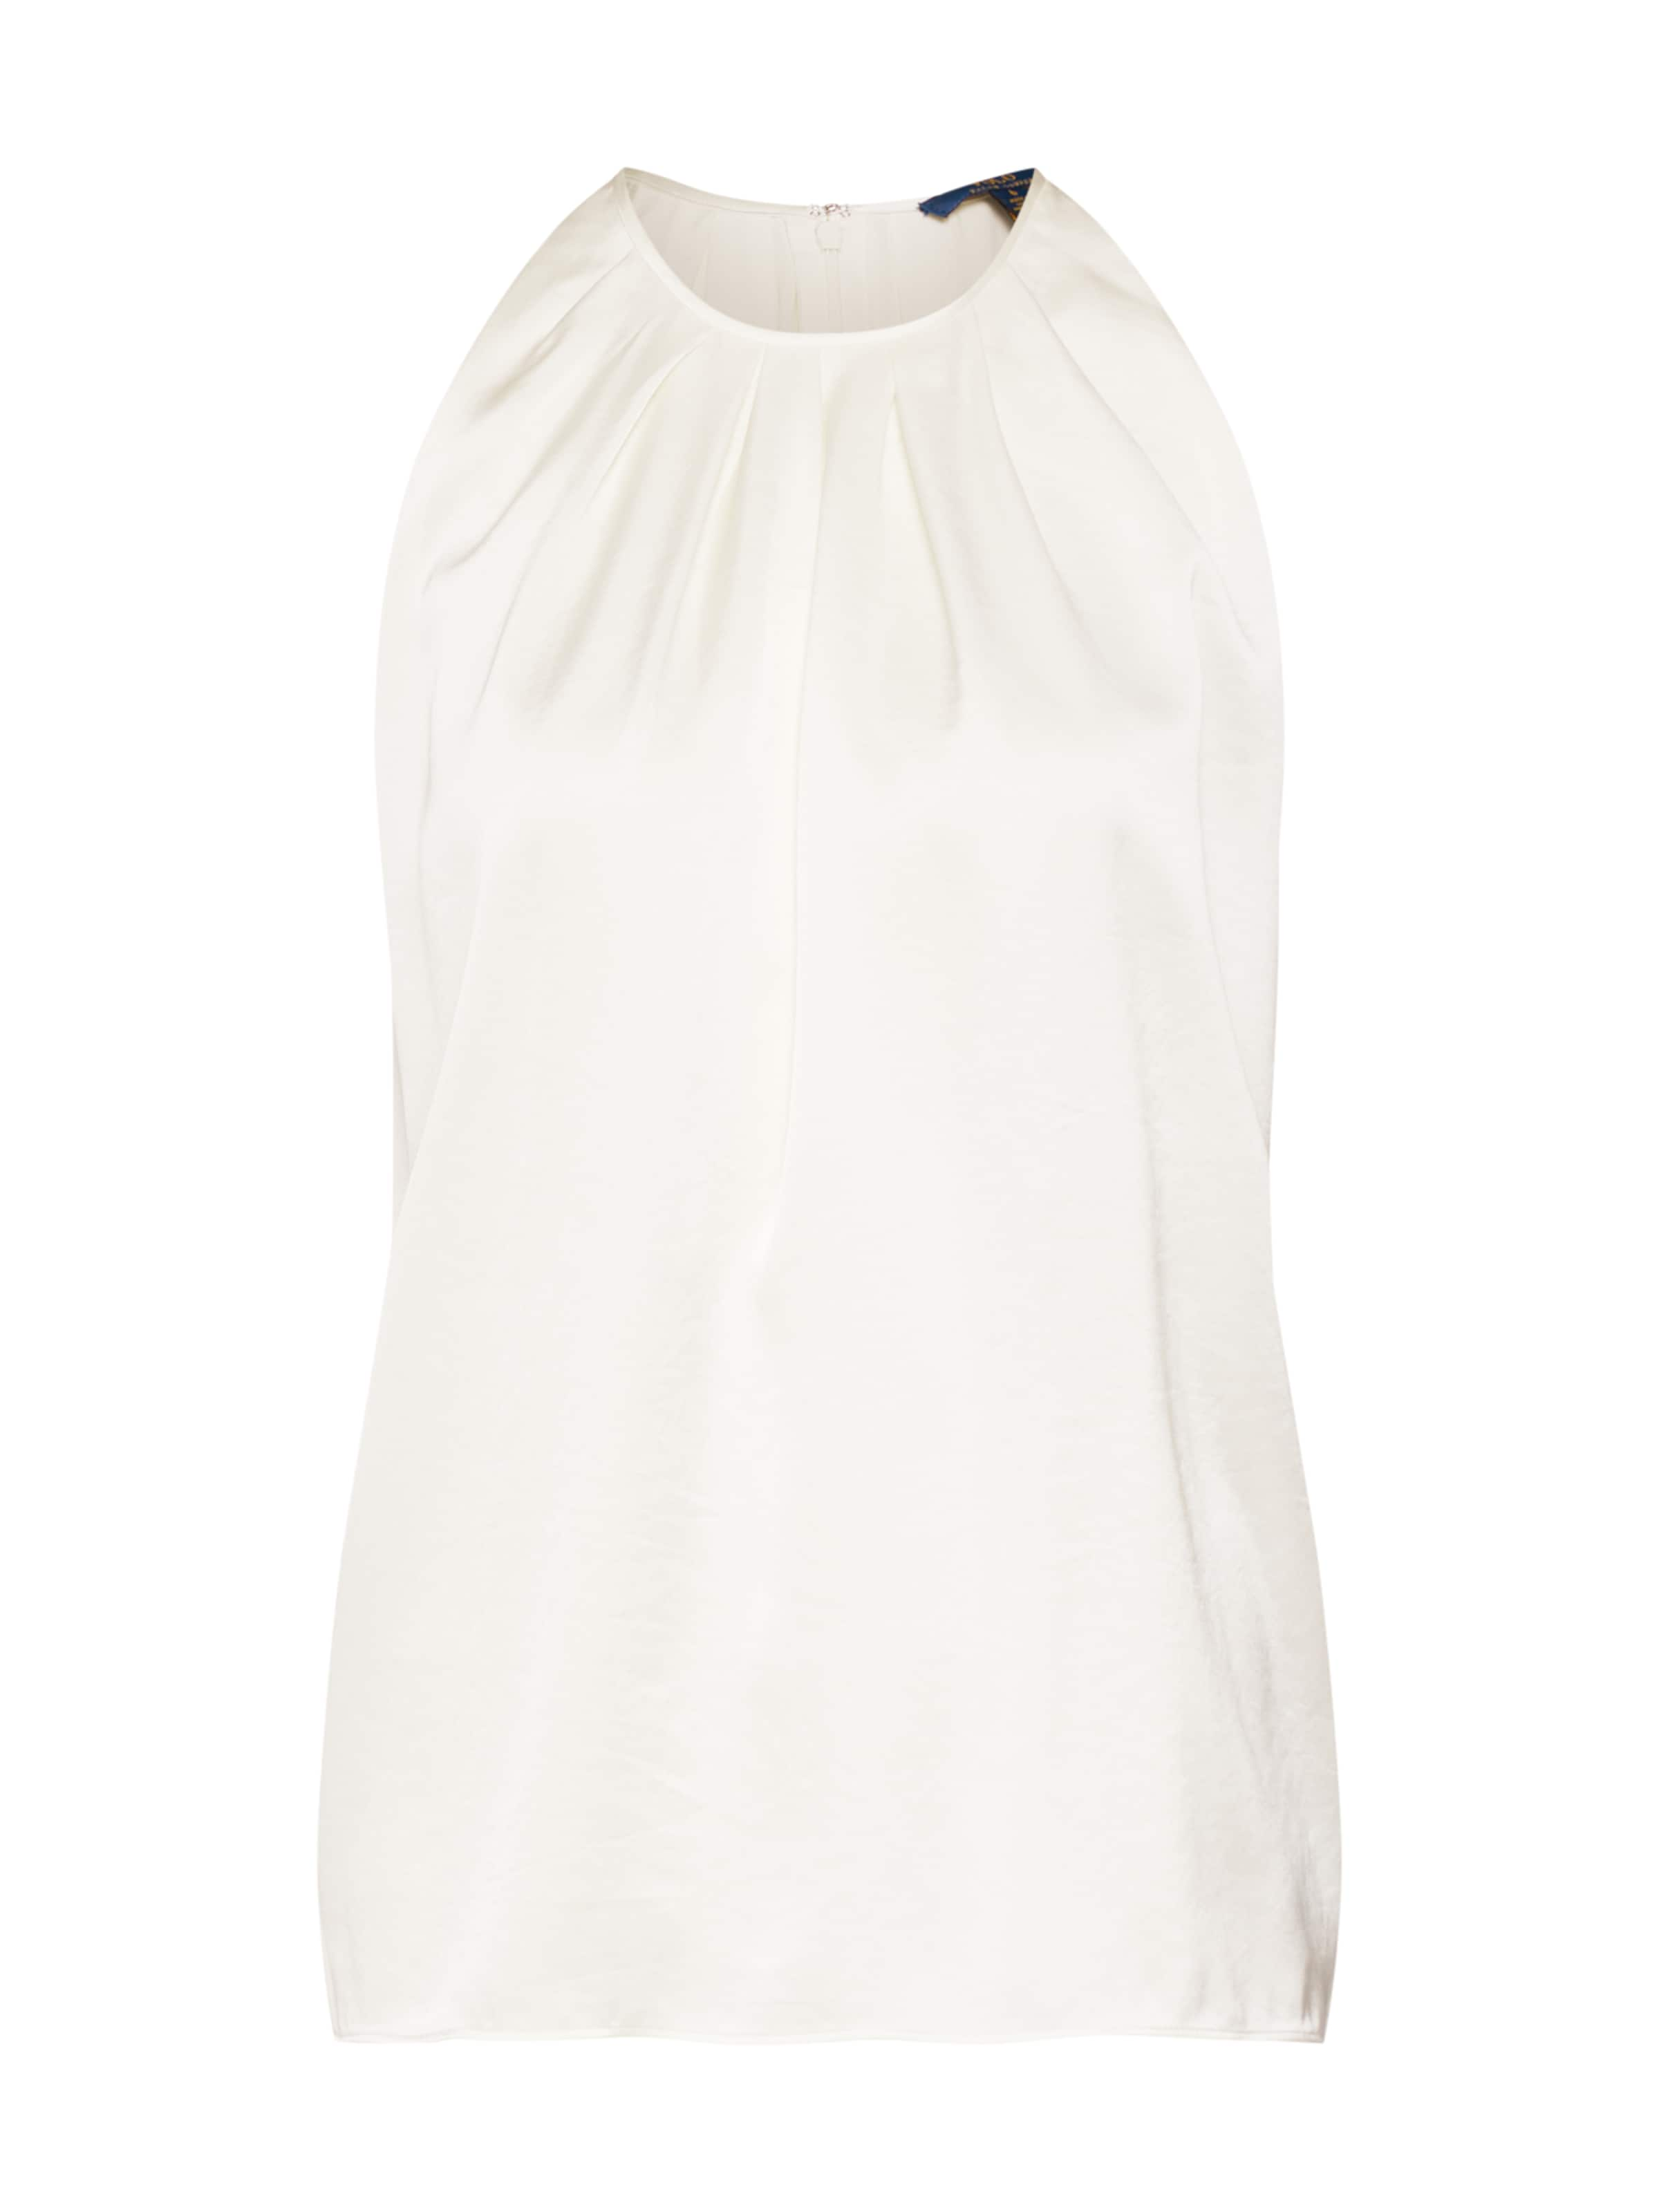 Creme Polo shirt' Ralph In Mrlo Lauren Shirt 'sl Tp sleeveless ARjL3cqS45